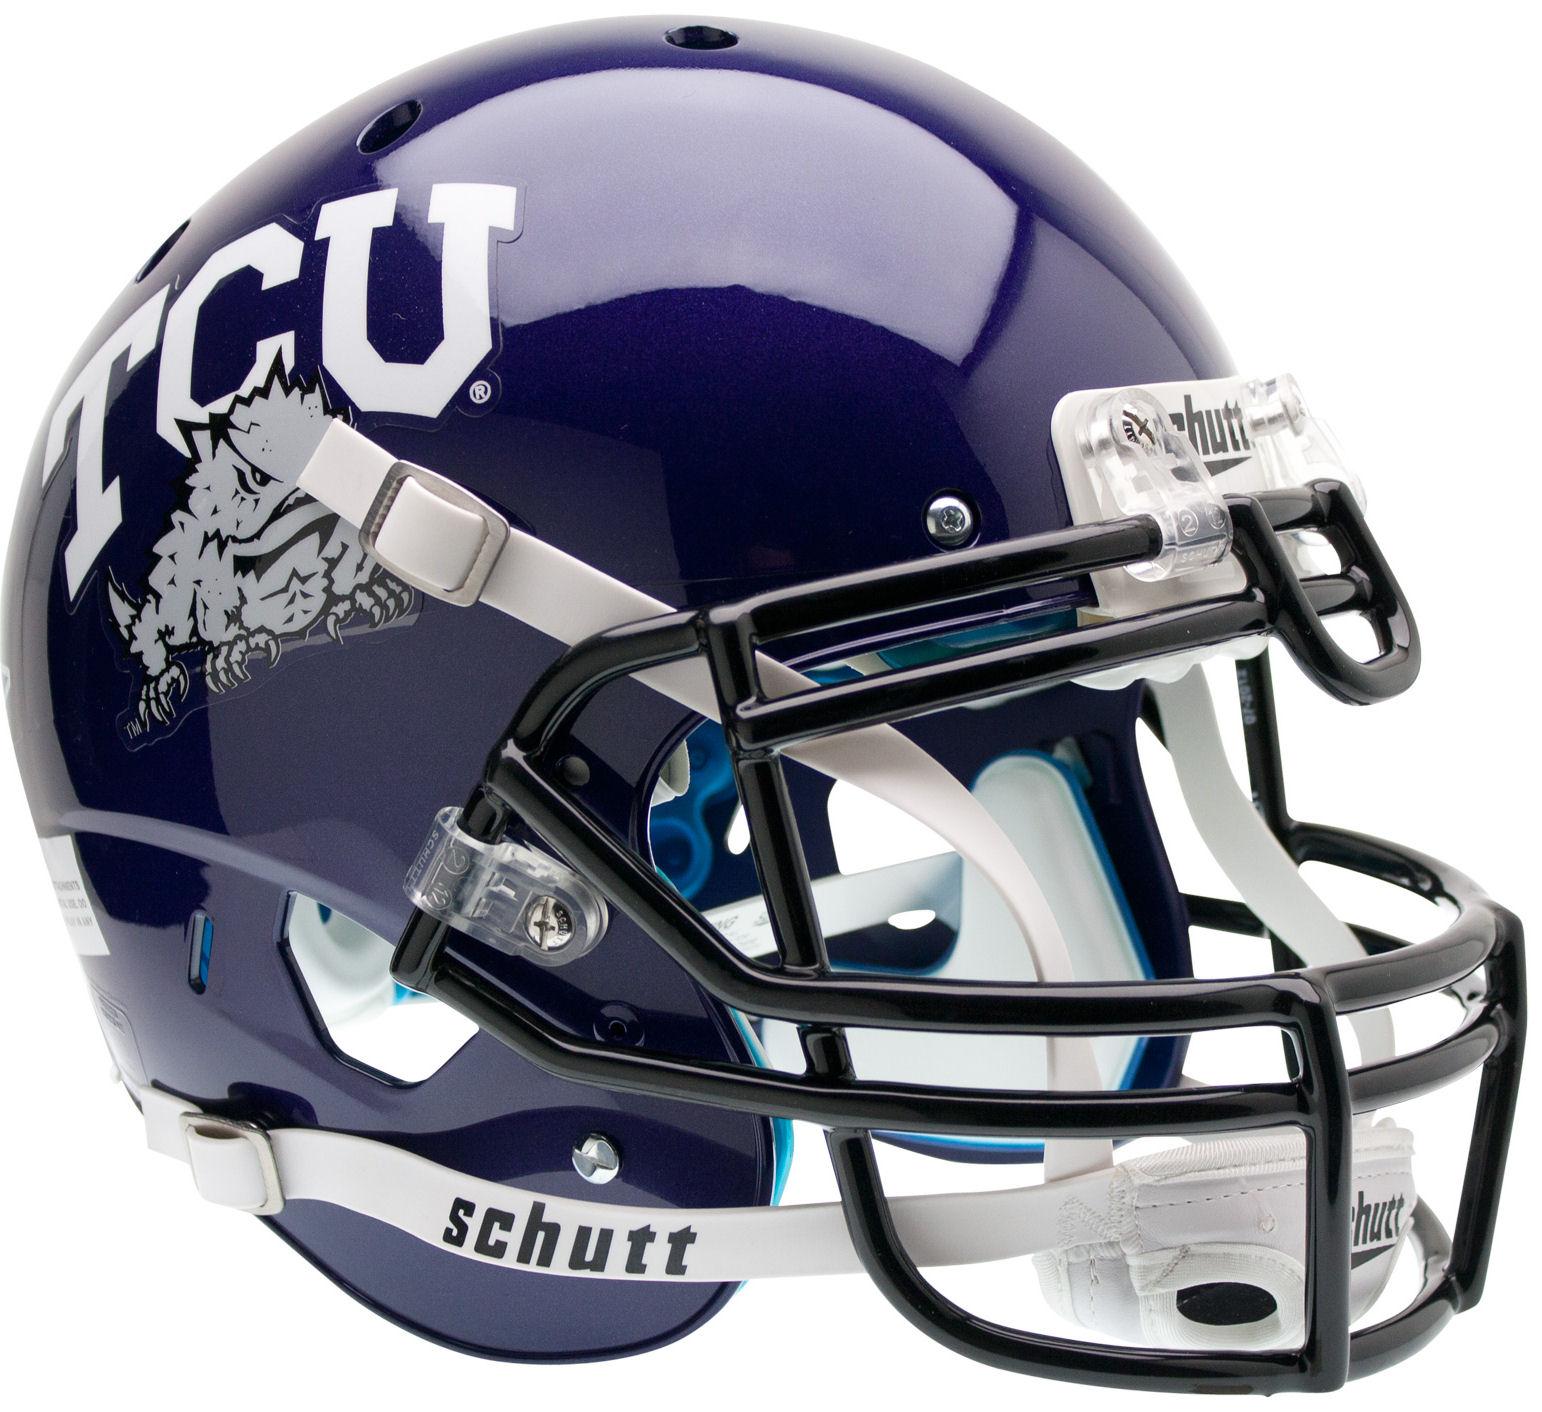 TCU Horned Frogs Authentic College XP Football Helmet Schutt